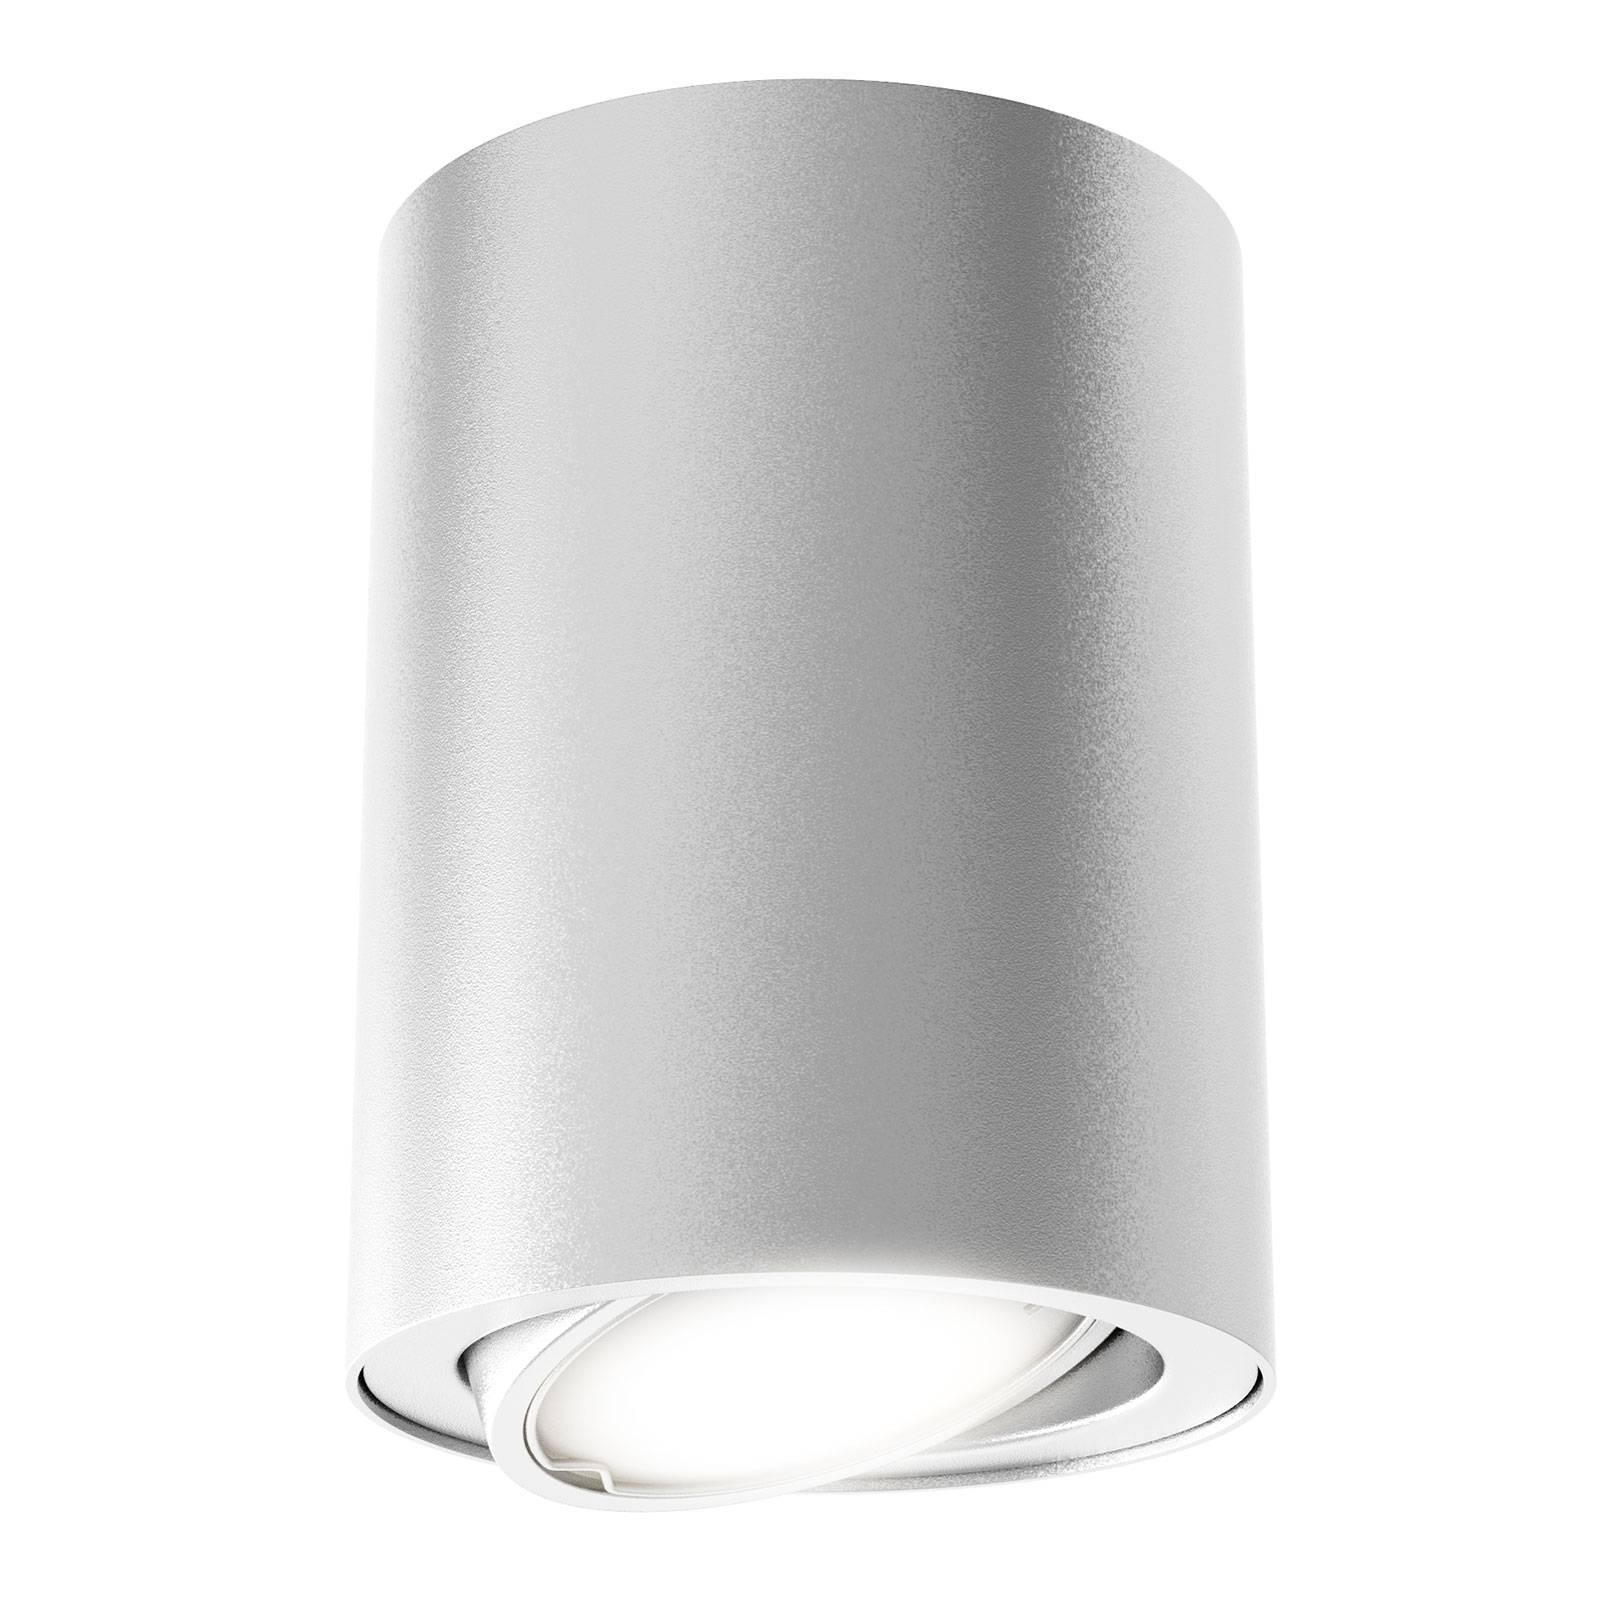 LED plafondlamp 7119 met GU10 LED, zilver